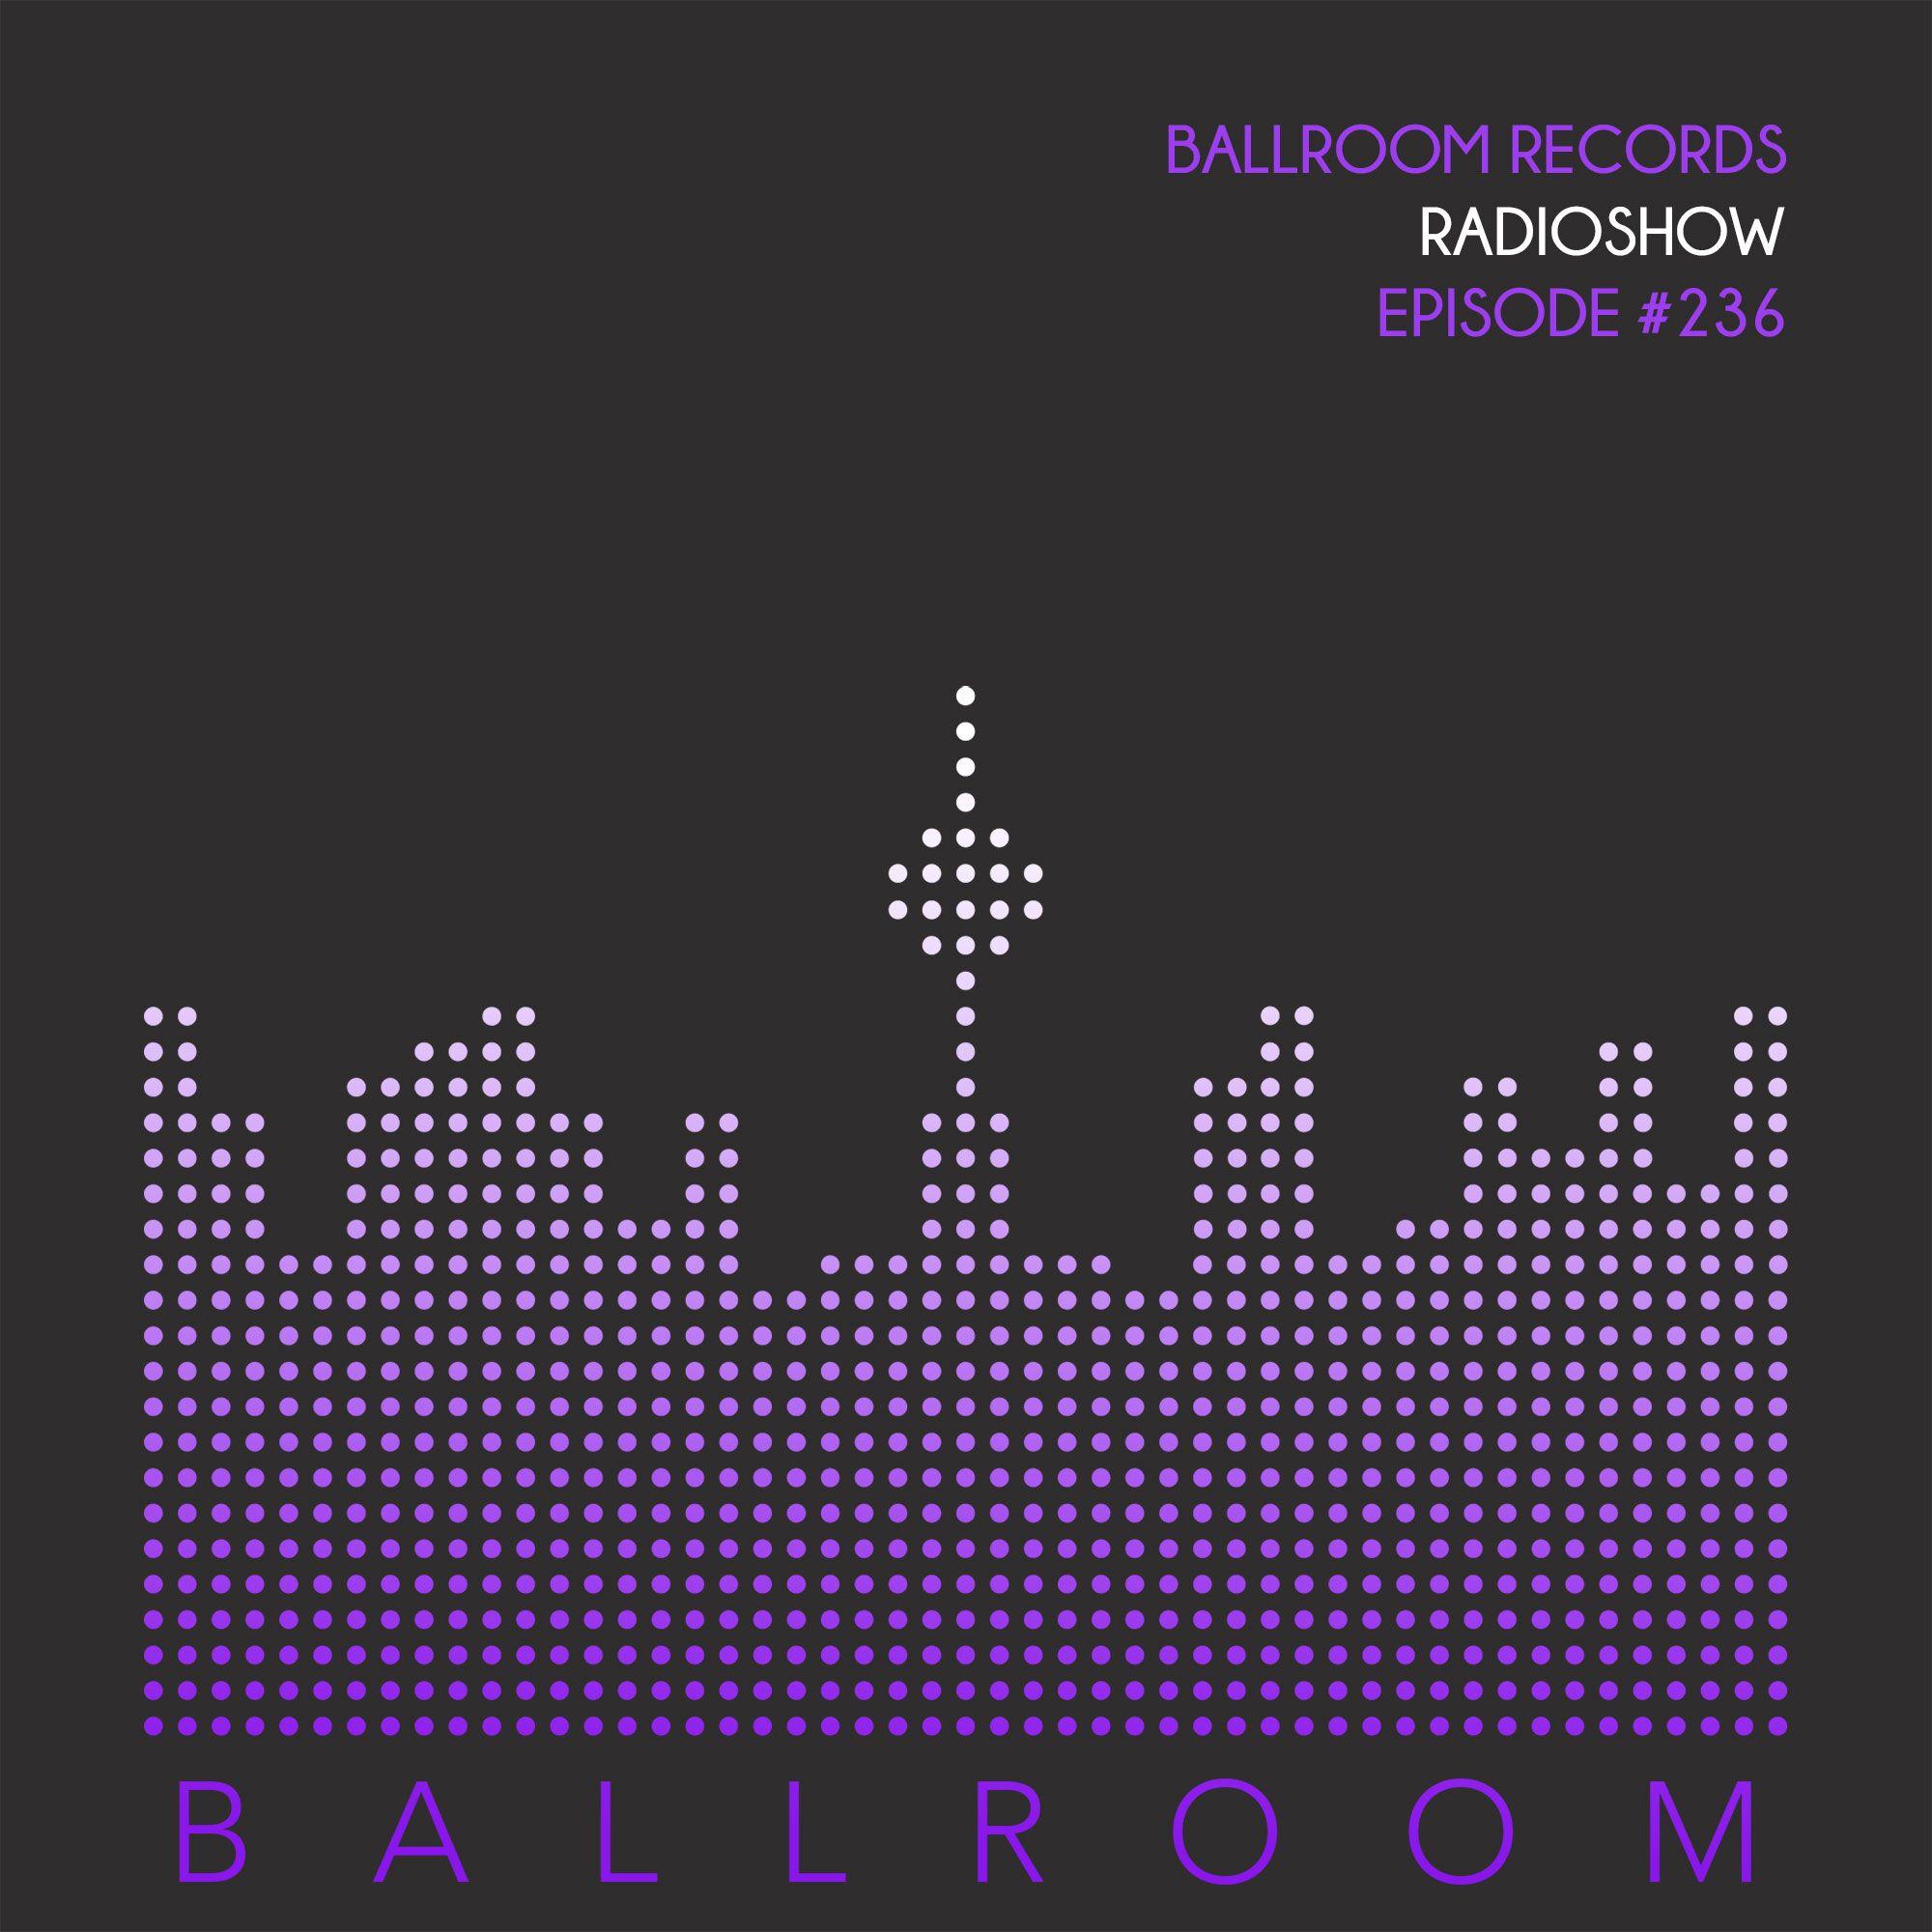 Albird — Ballroom Records Radioshow #236